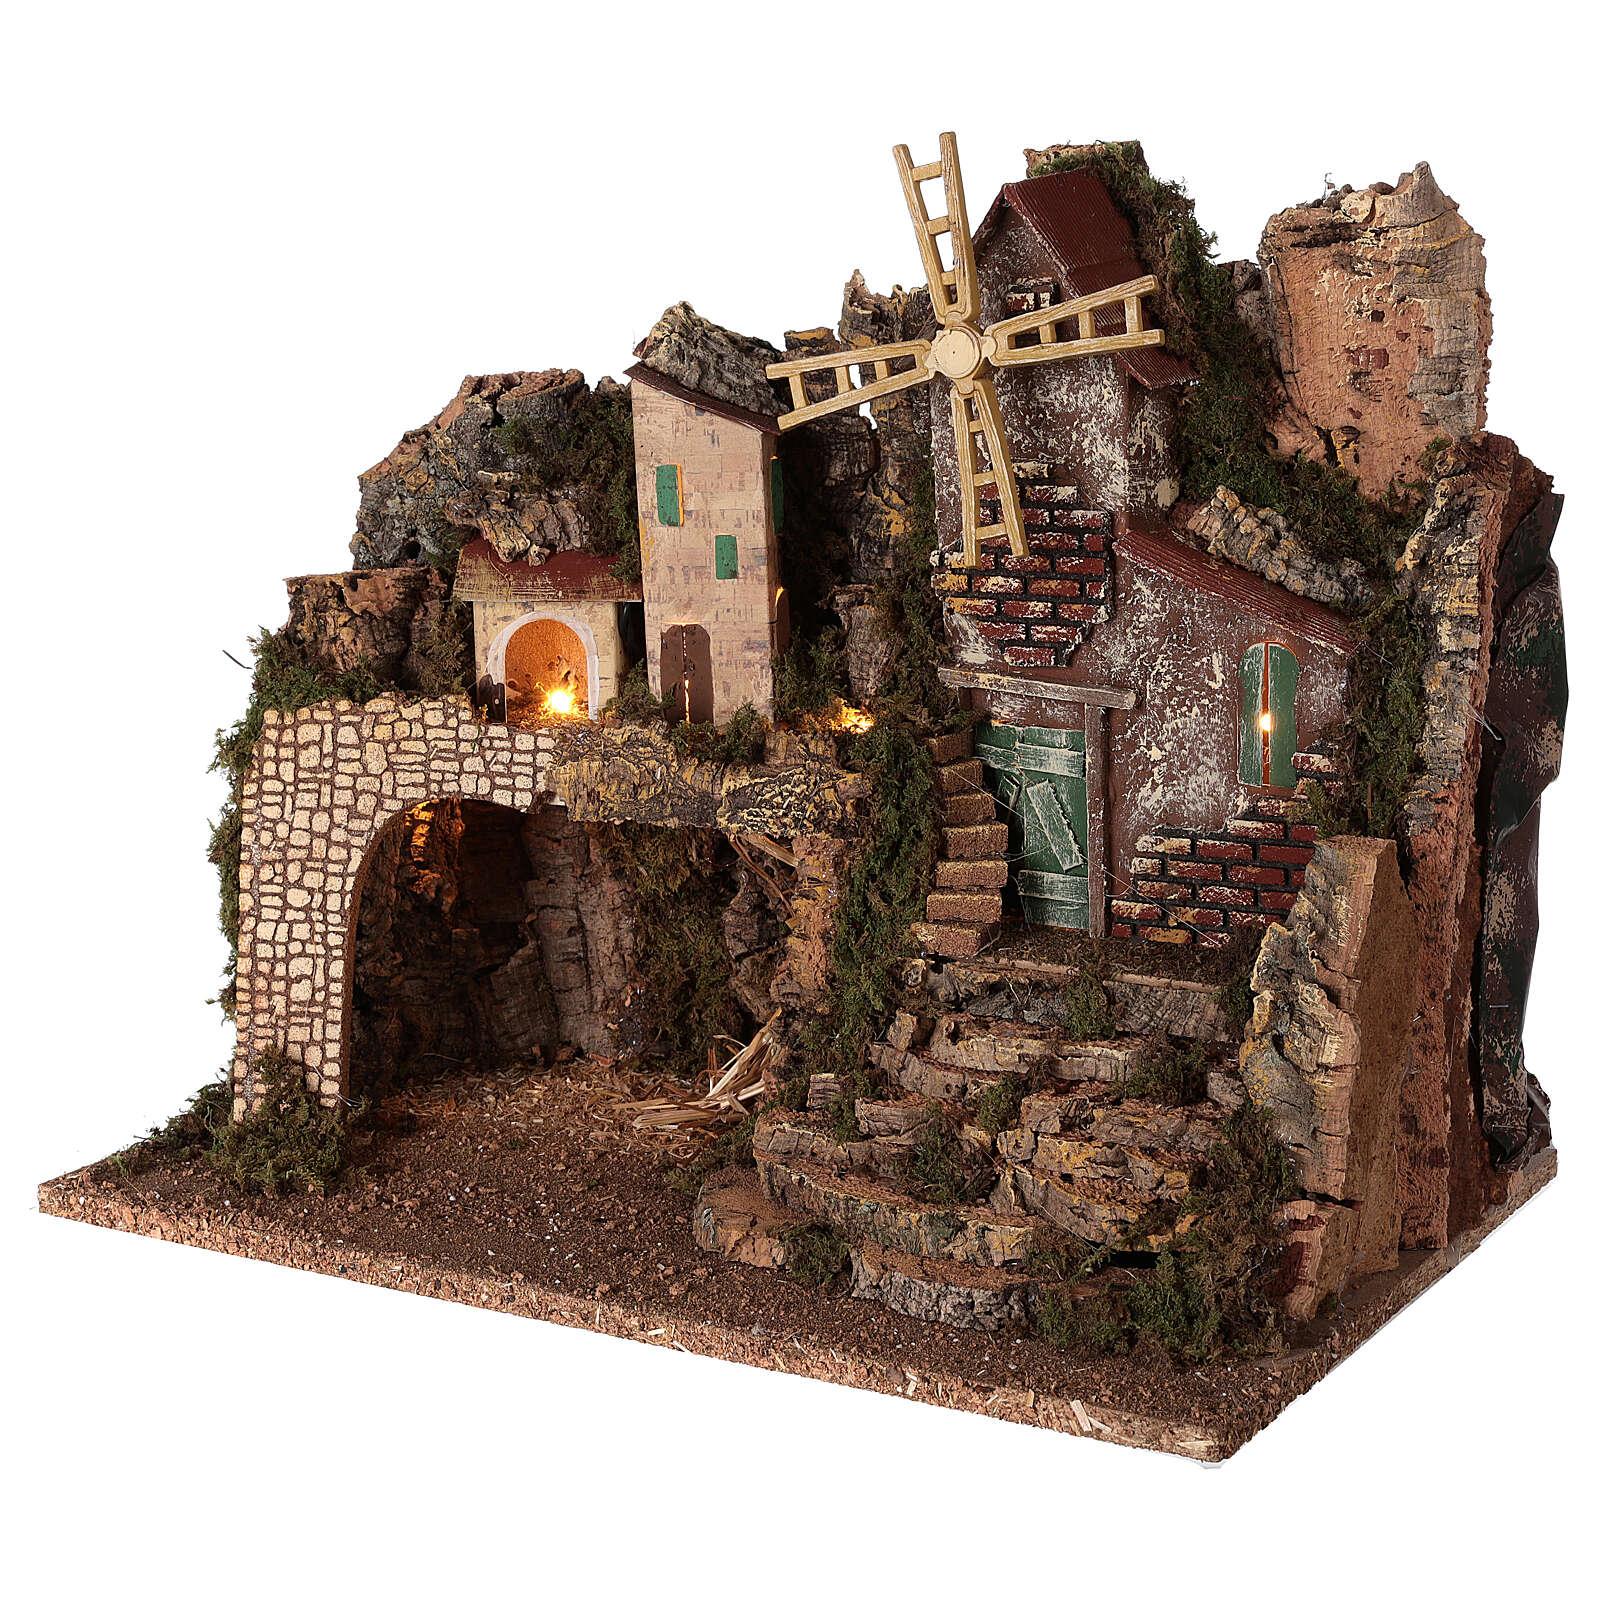 Lighted nativity village with steps 35x45x30 cm 8 cm nativity 4